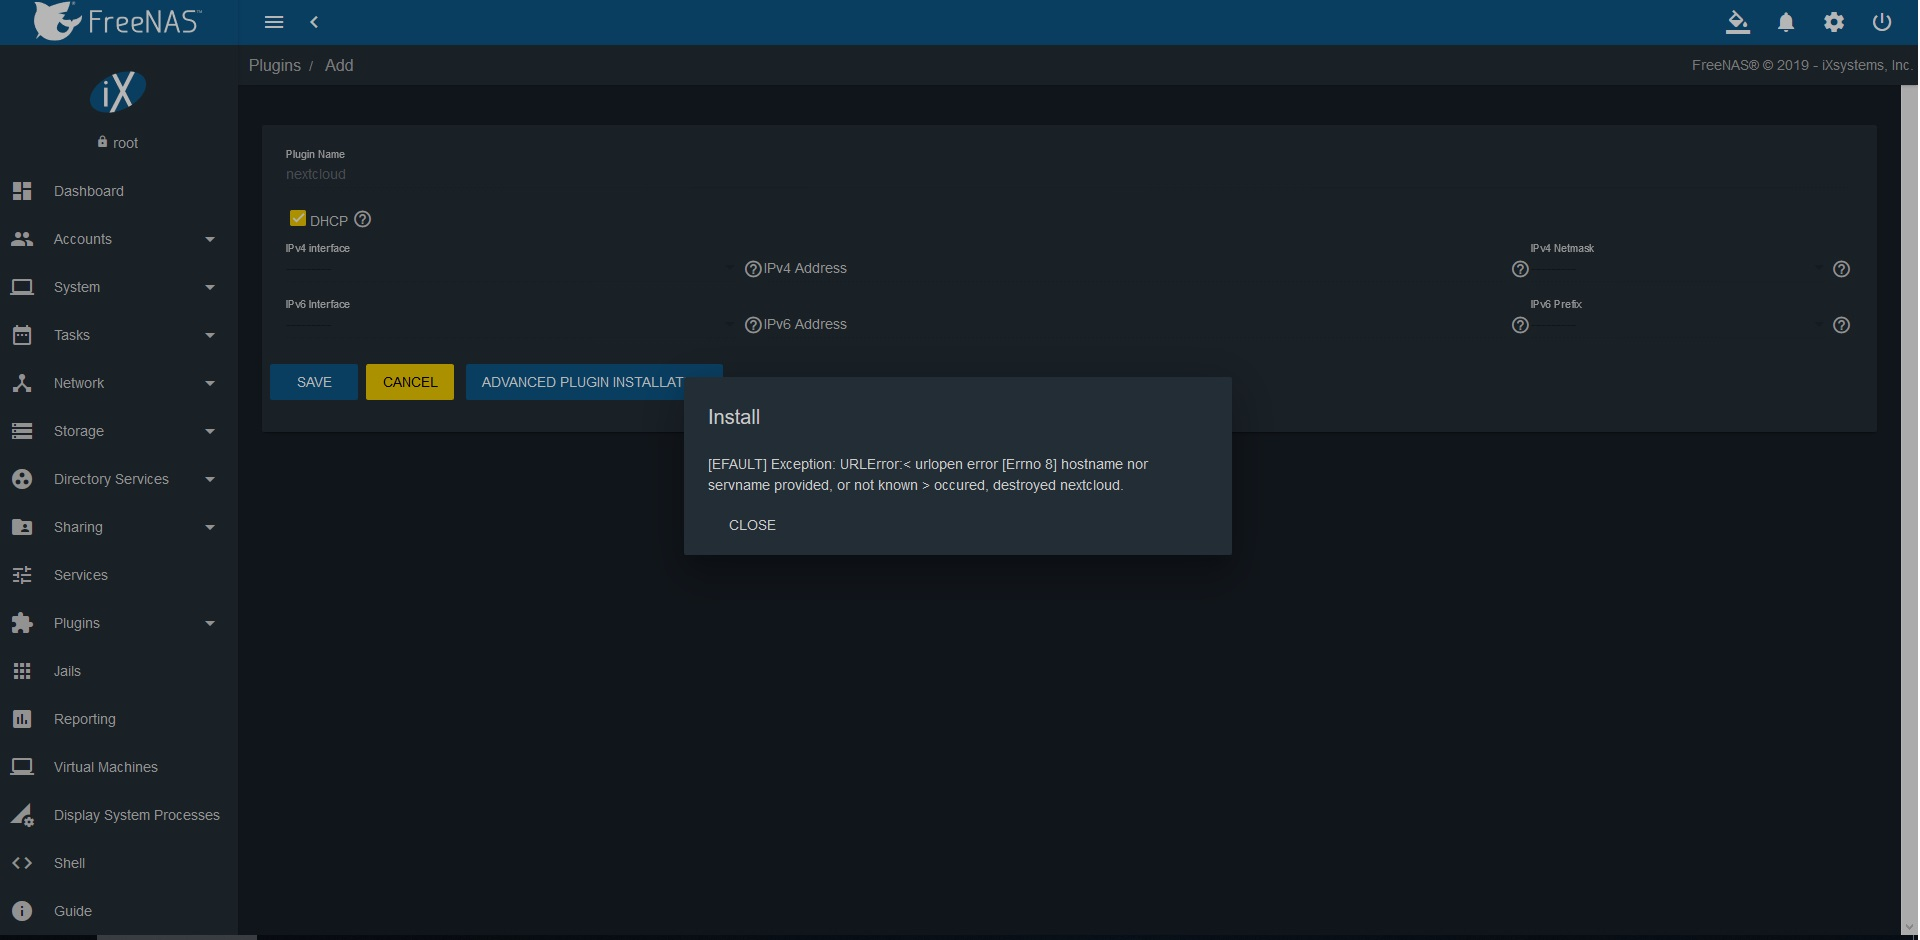 Install errors using freenas - installation - Nextcloud community